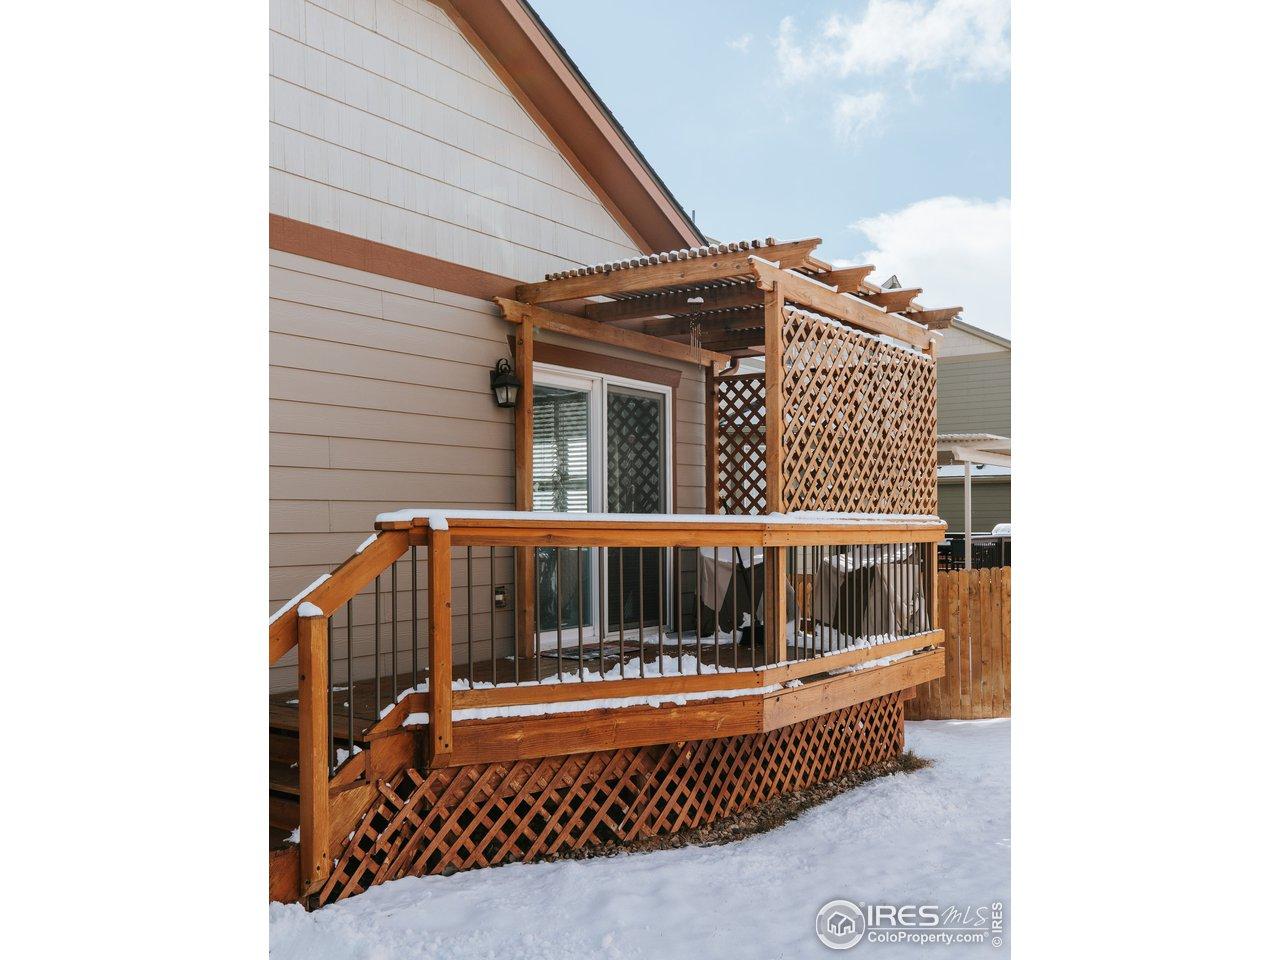 Great addition of wood deck & pergola